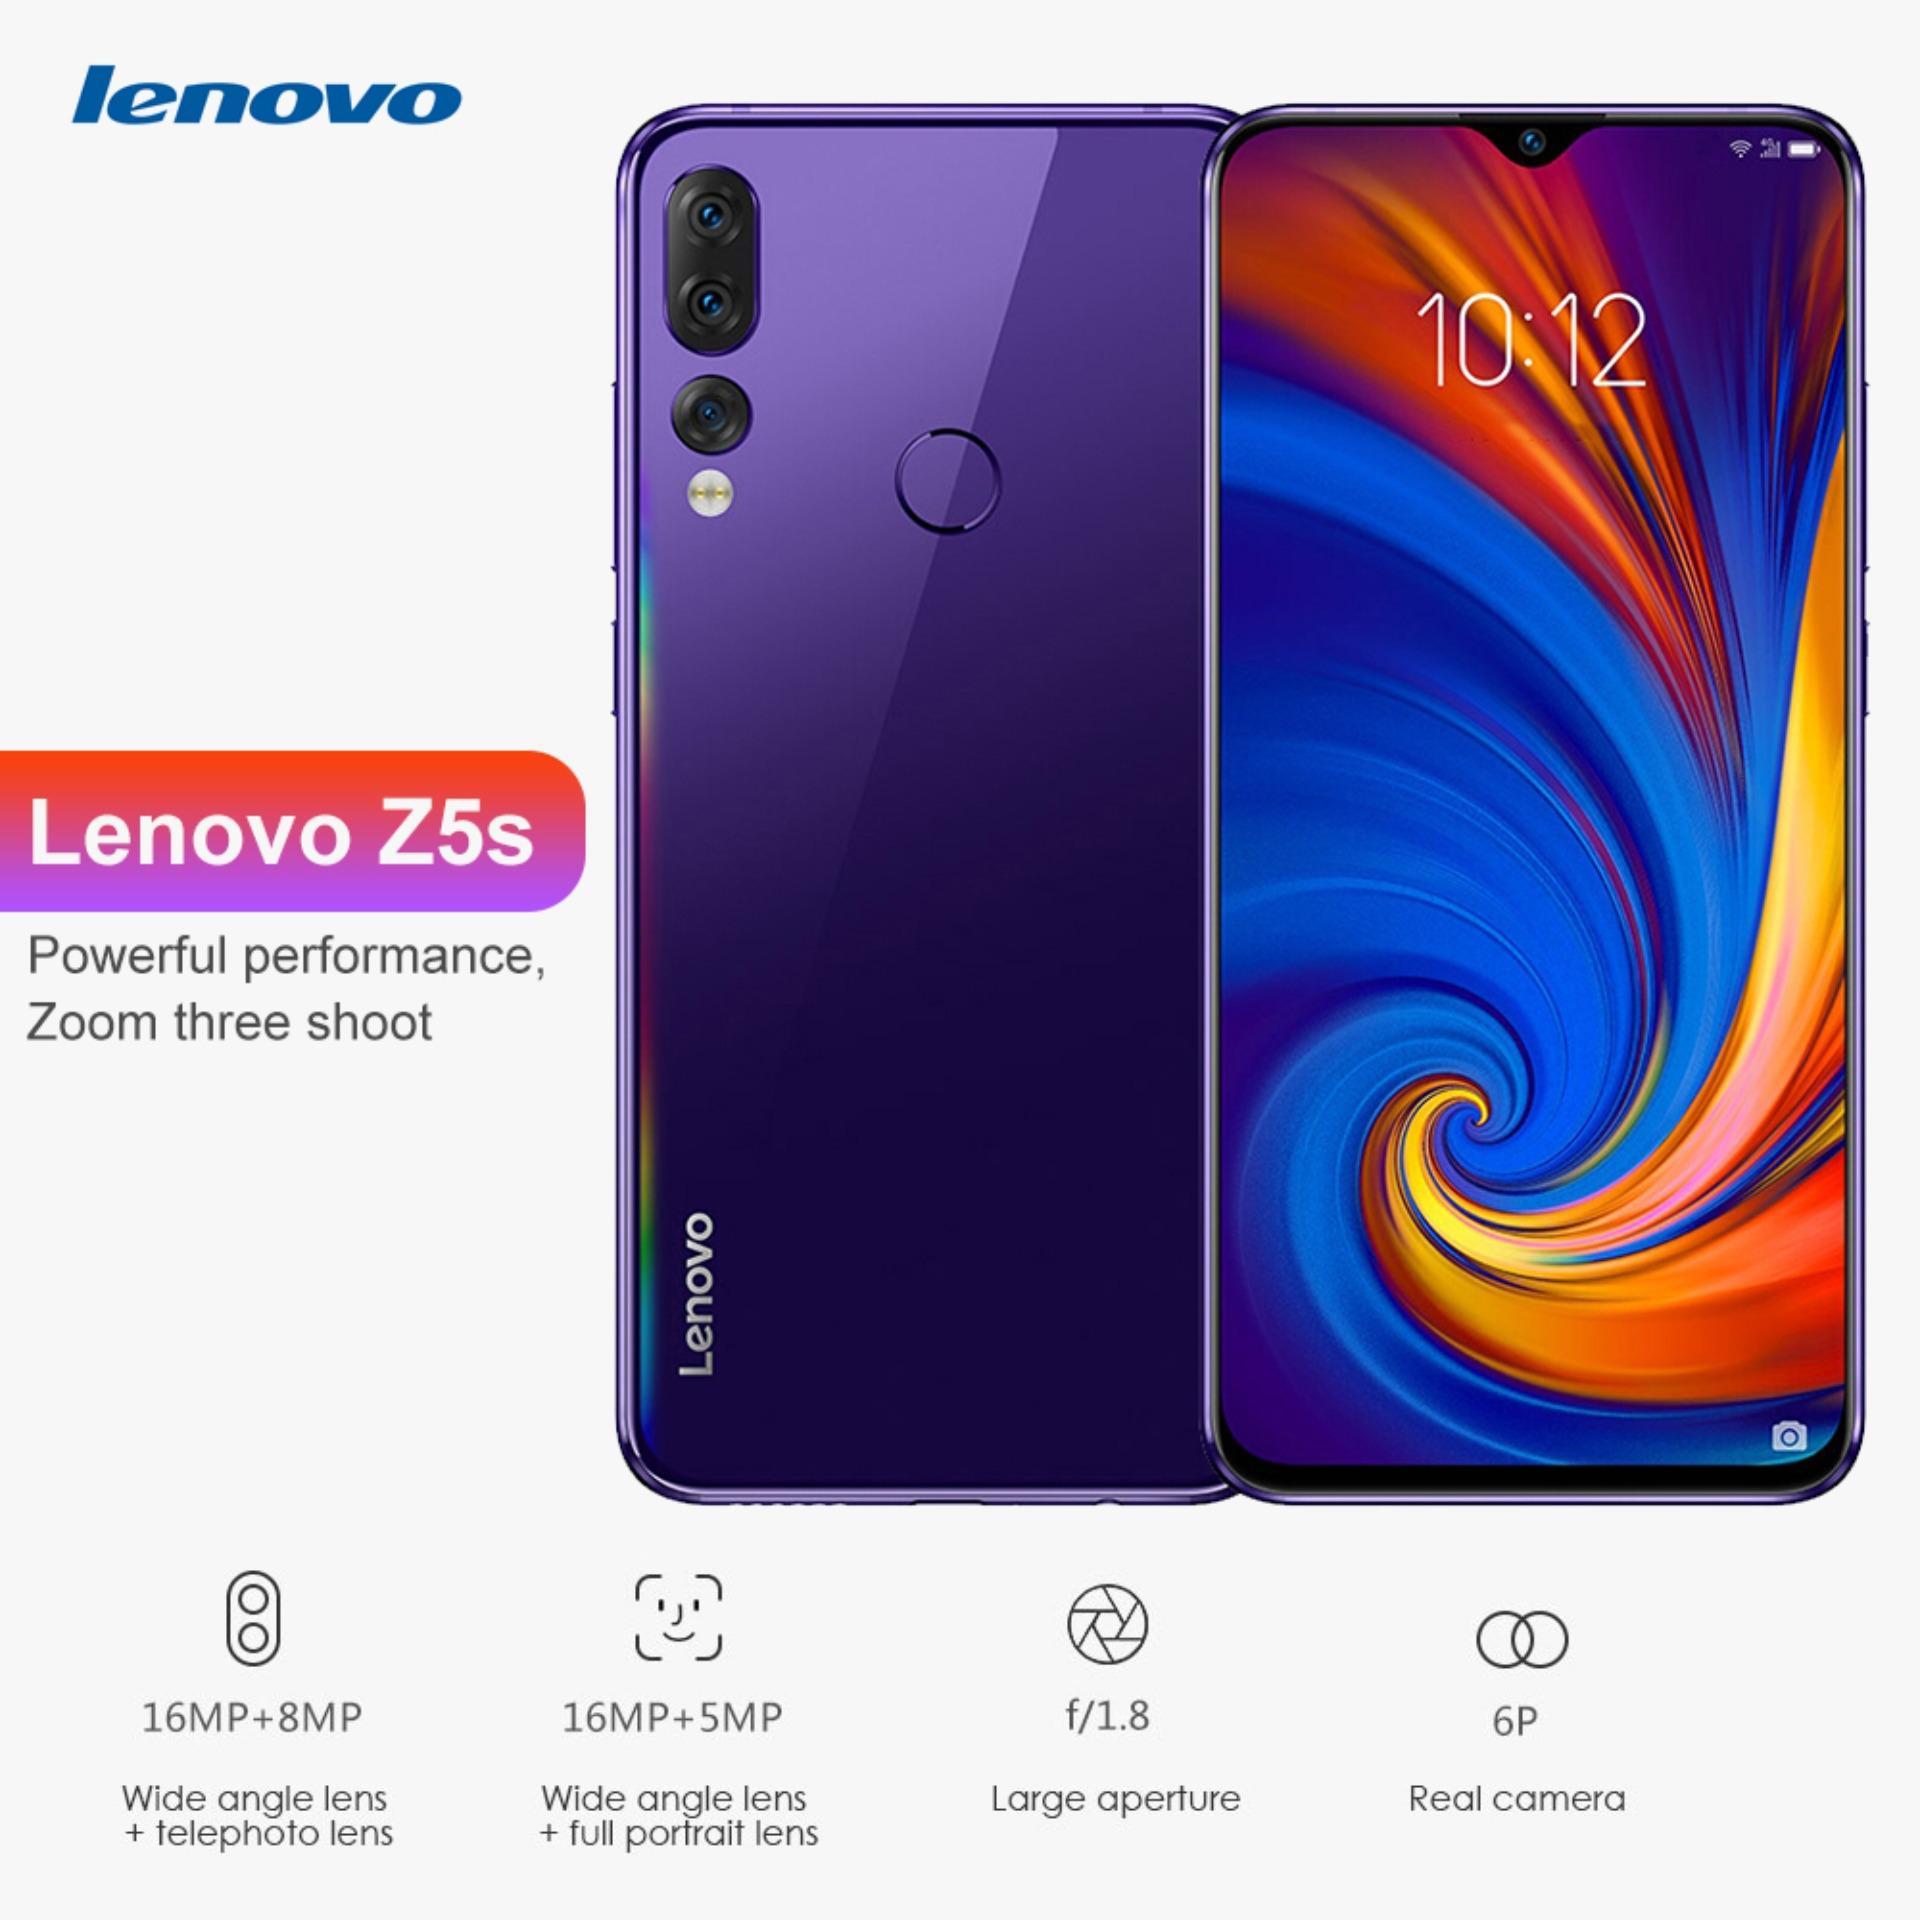 Lenovo Philippines - Lenovo Phone for sale - prices & reviews | Lazada